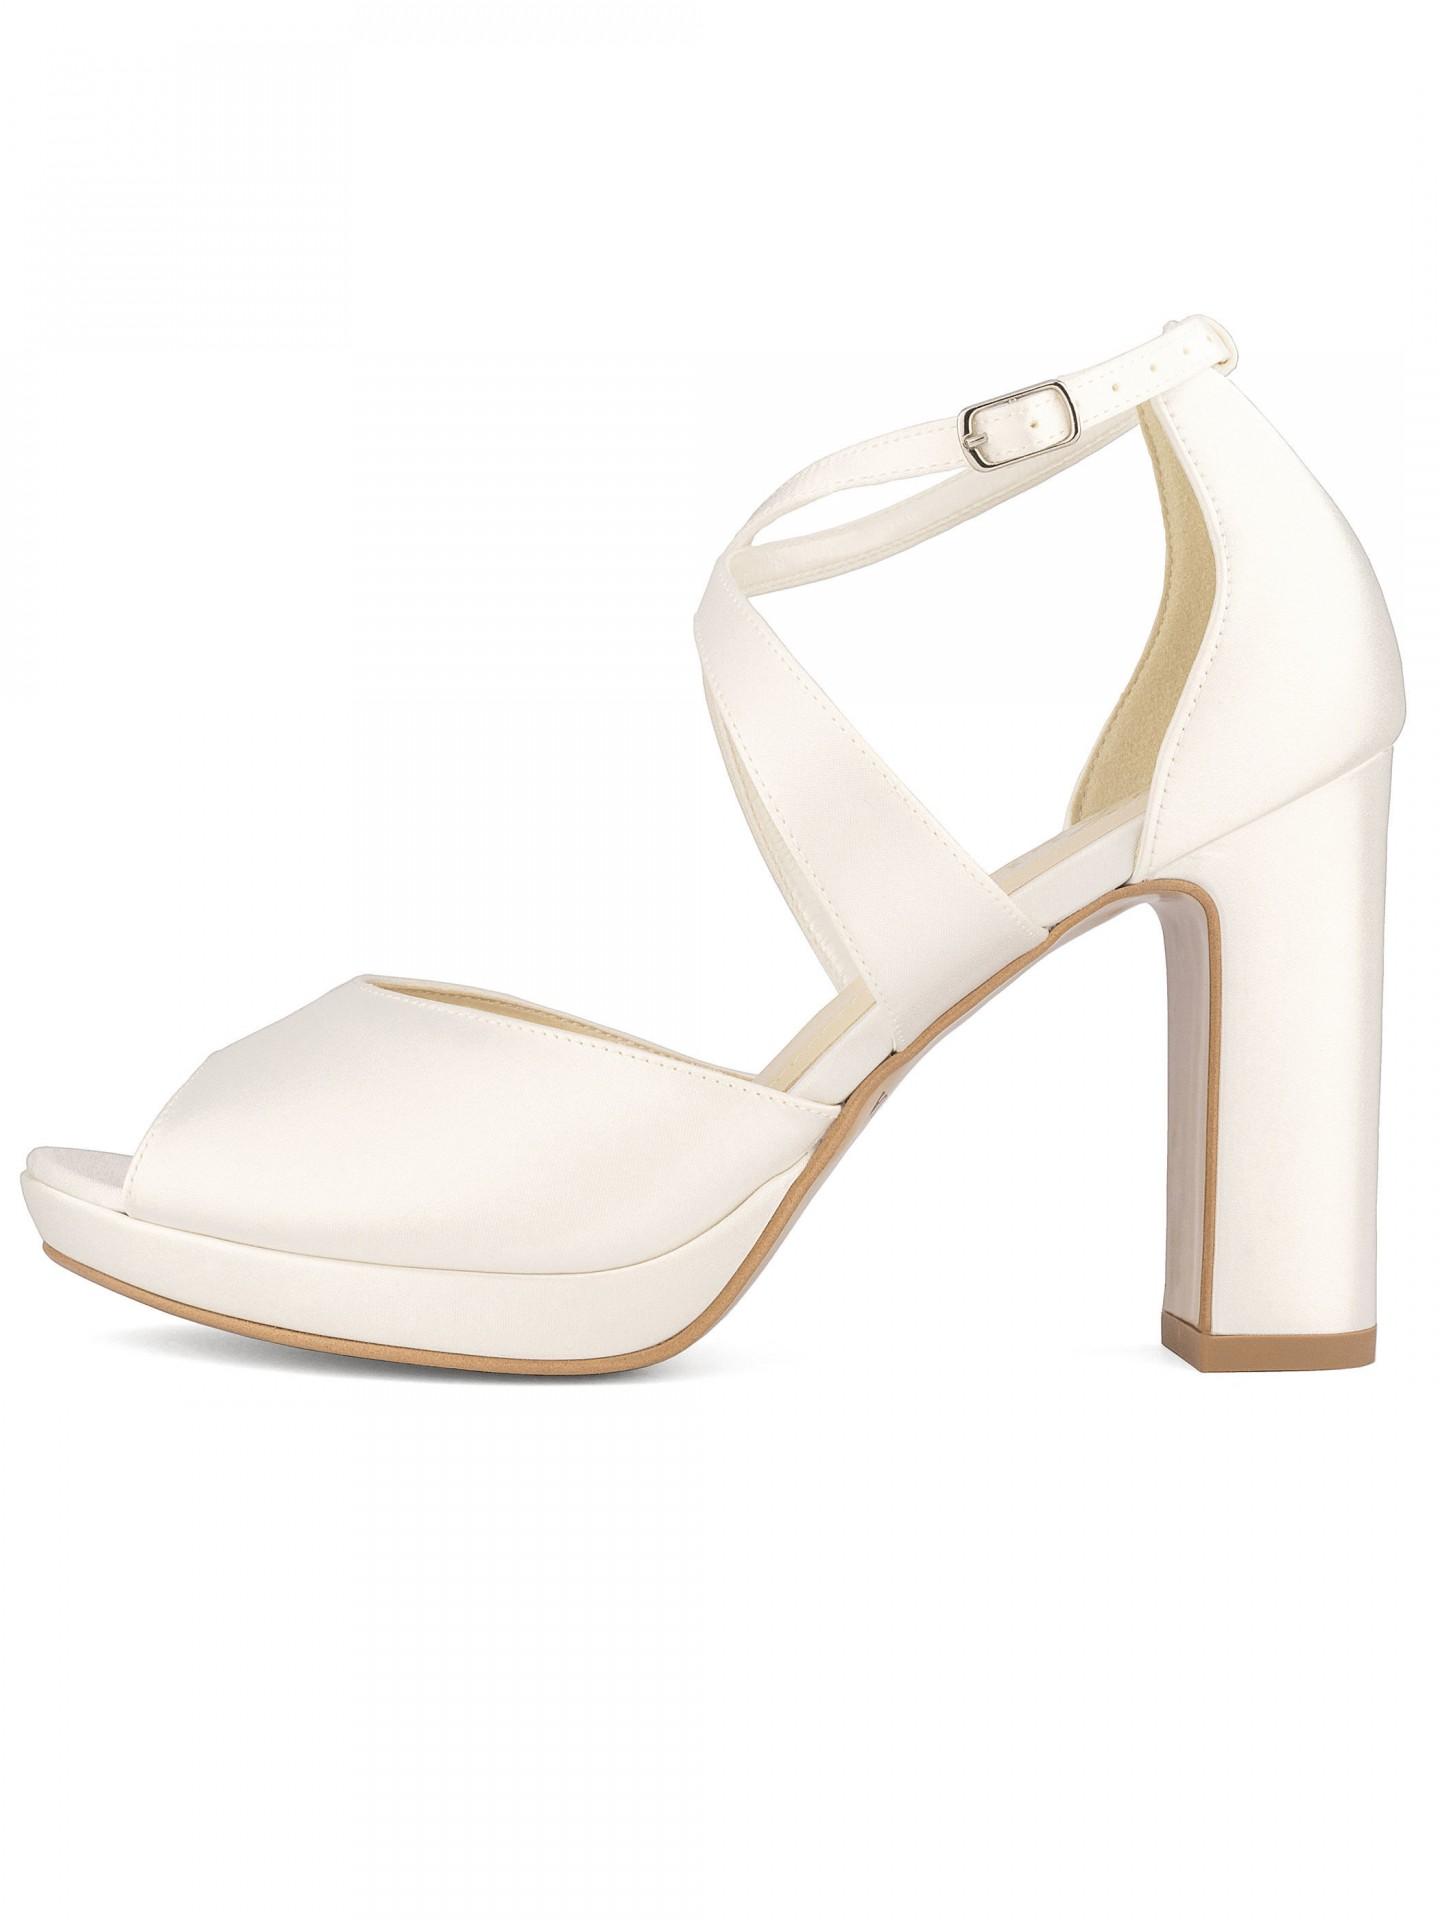 Sapatos Cindy